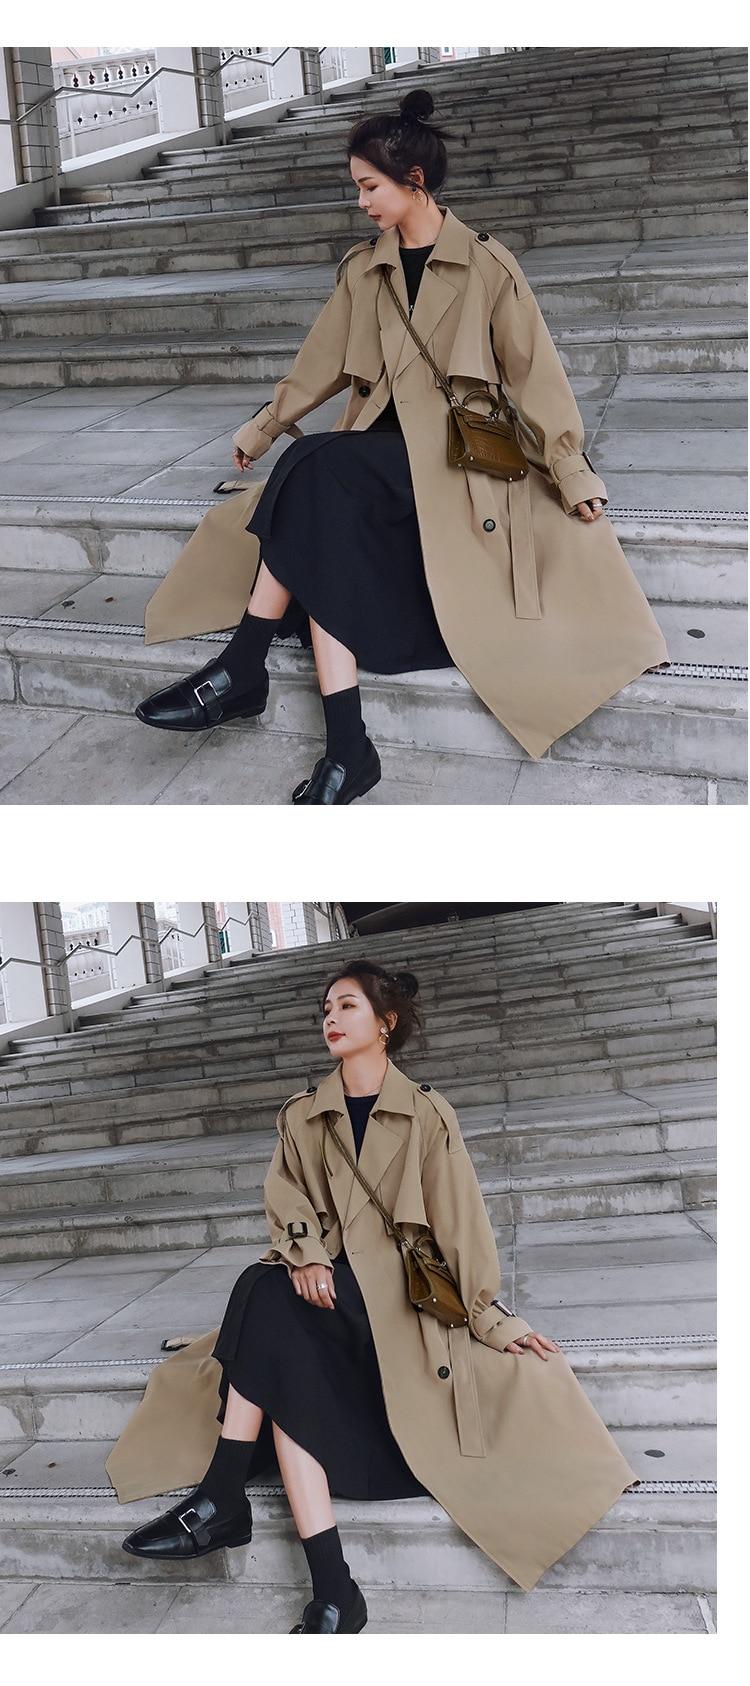 Haff160e6b39949d48e48498ced06746fP 2021 Autumn Women Trench Coat With Belt Women Clothes Blue Coat Casaco Feminino Harajuku Abrigo Mujer Long Trench Femme